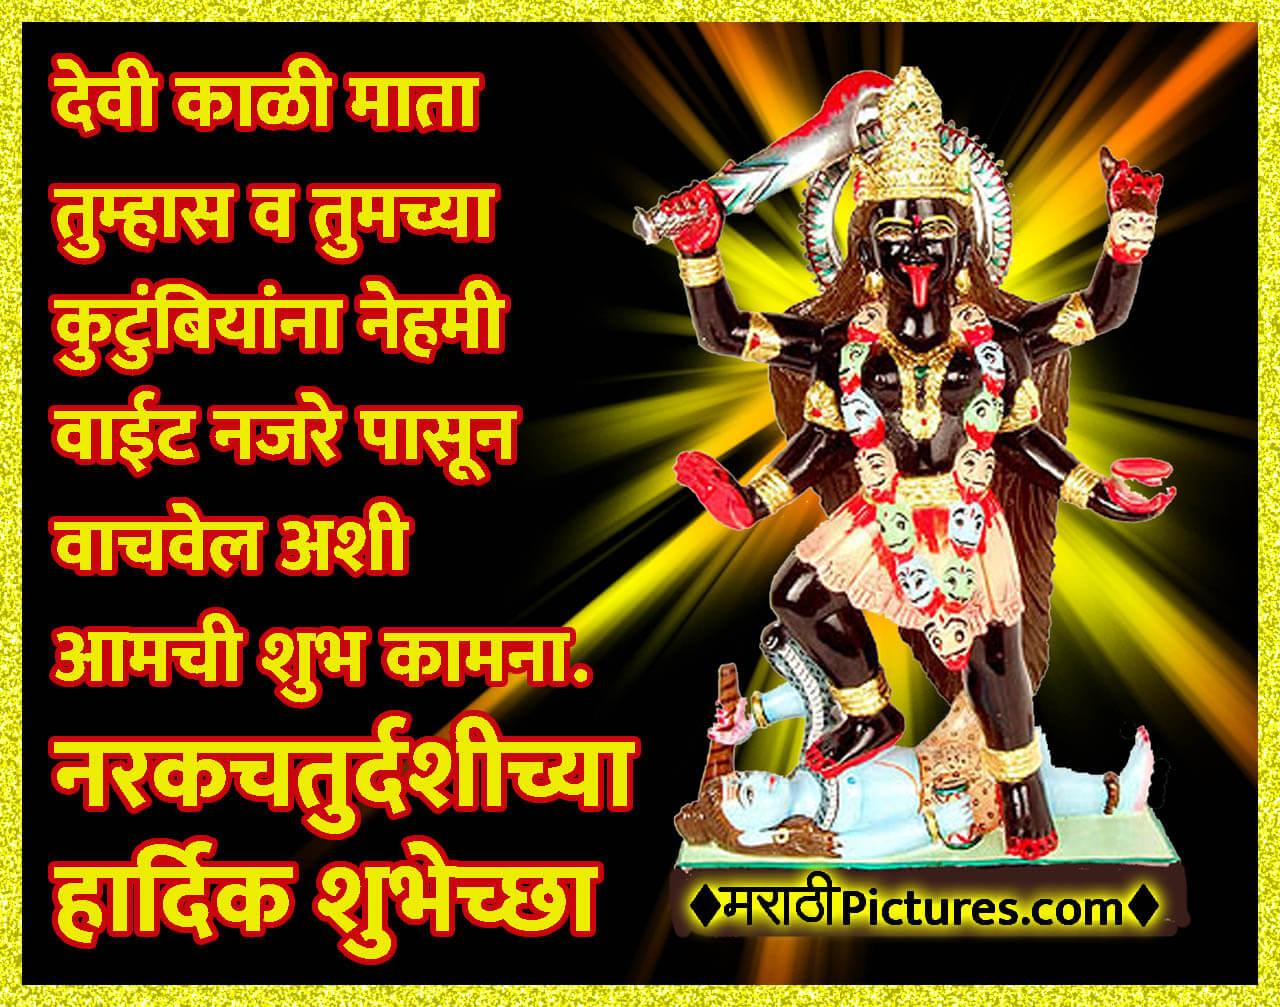 Narak Chaturdashi Chya Hardik Shubhechha - Marathi ... Vadhdivas Chya Hardik Shubhechha